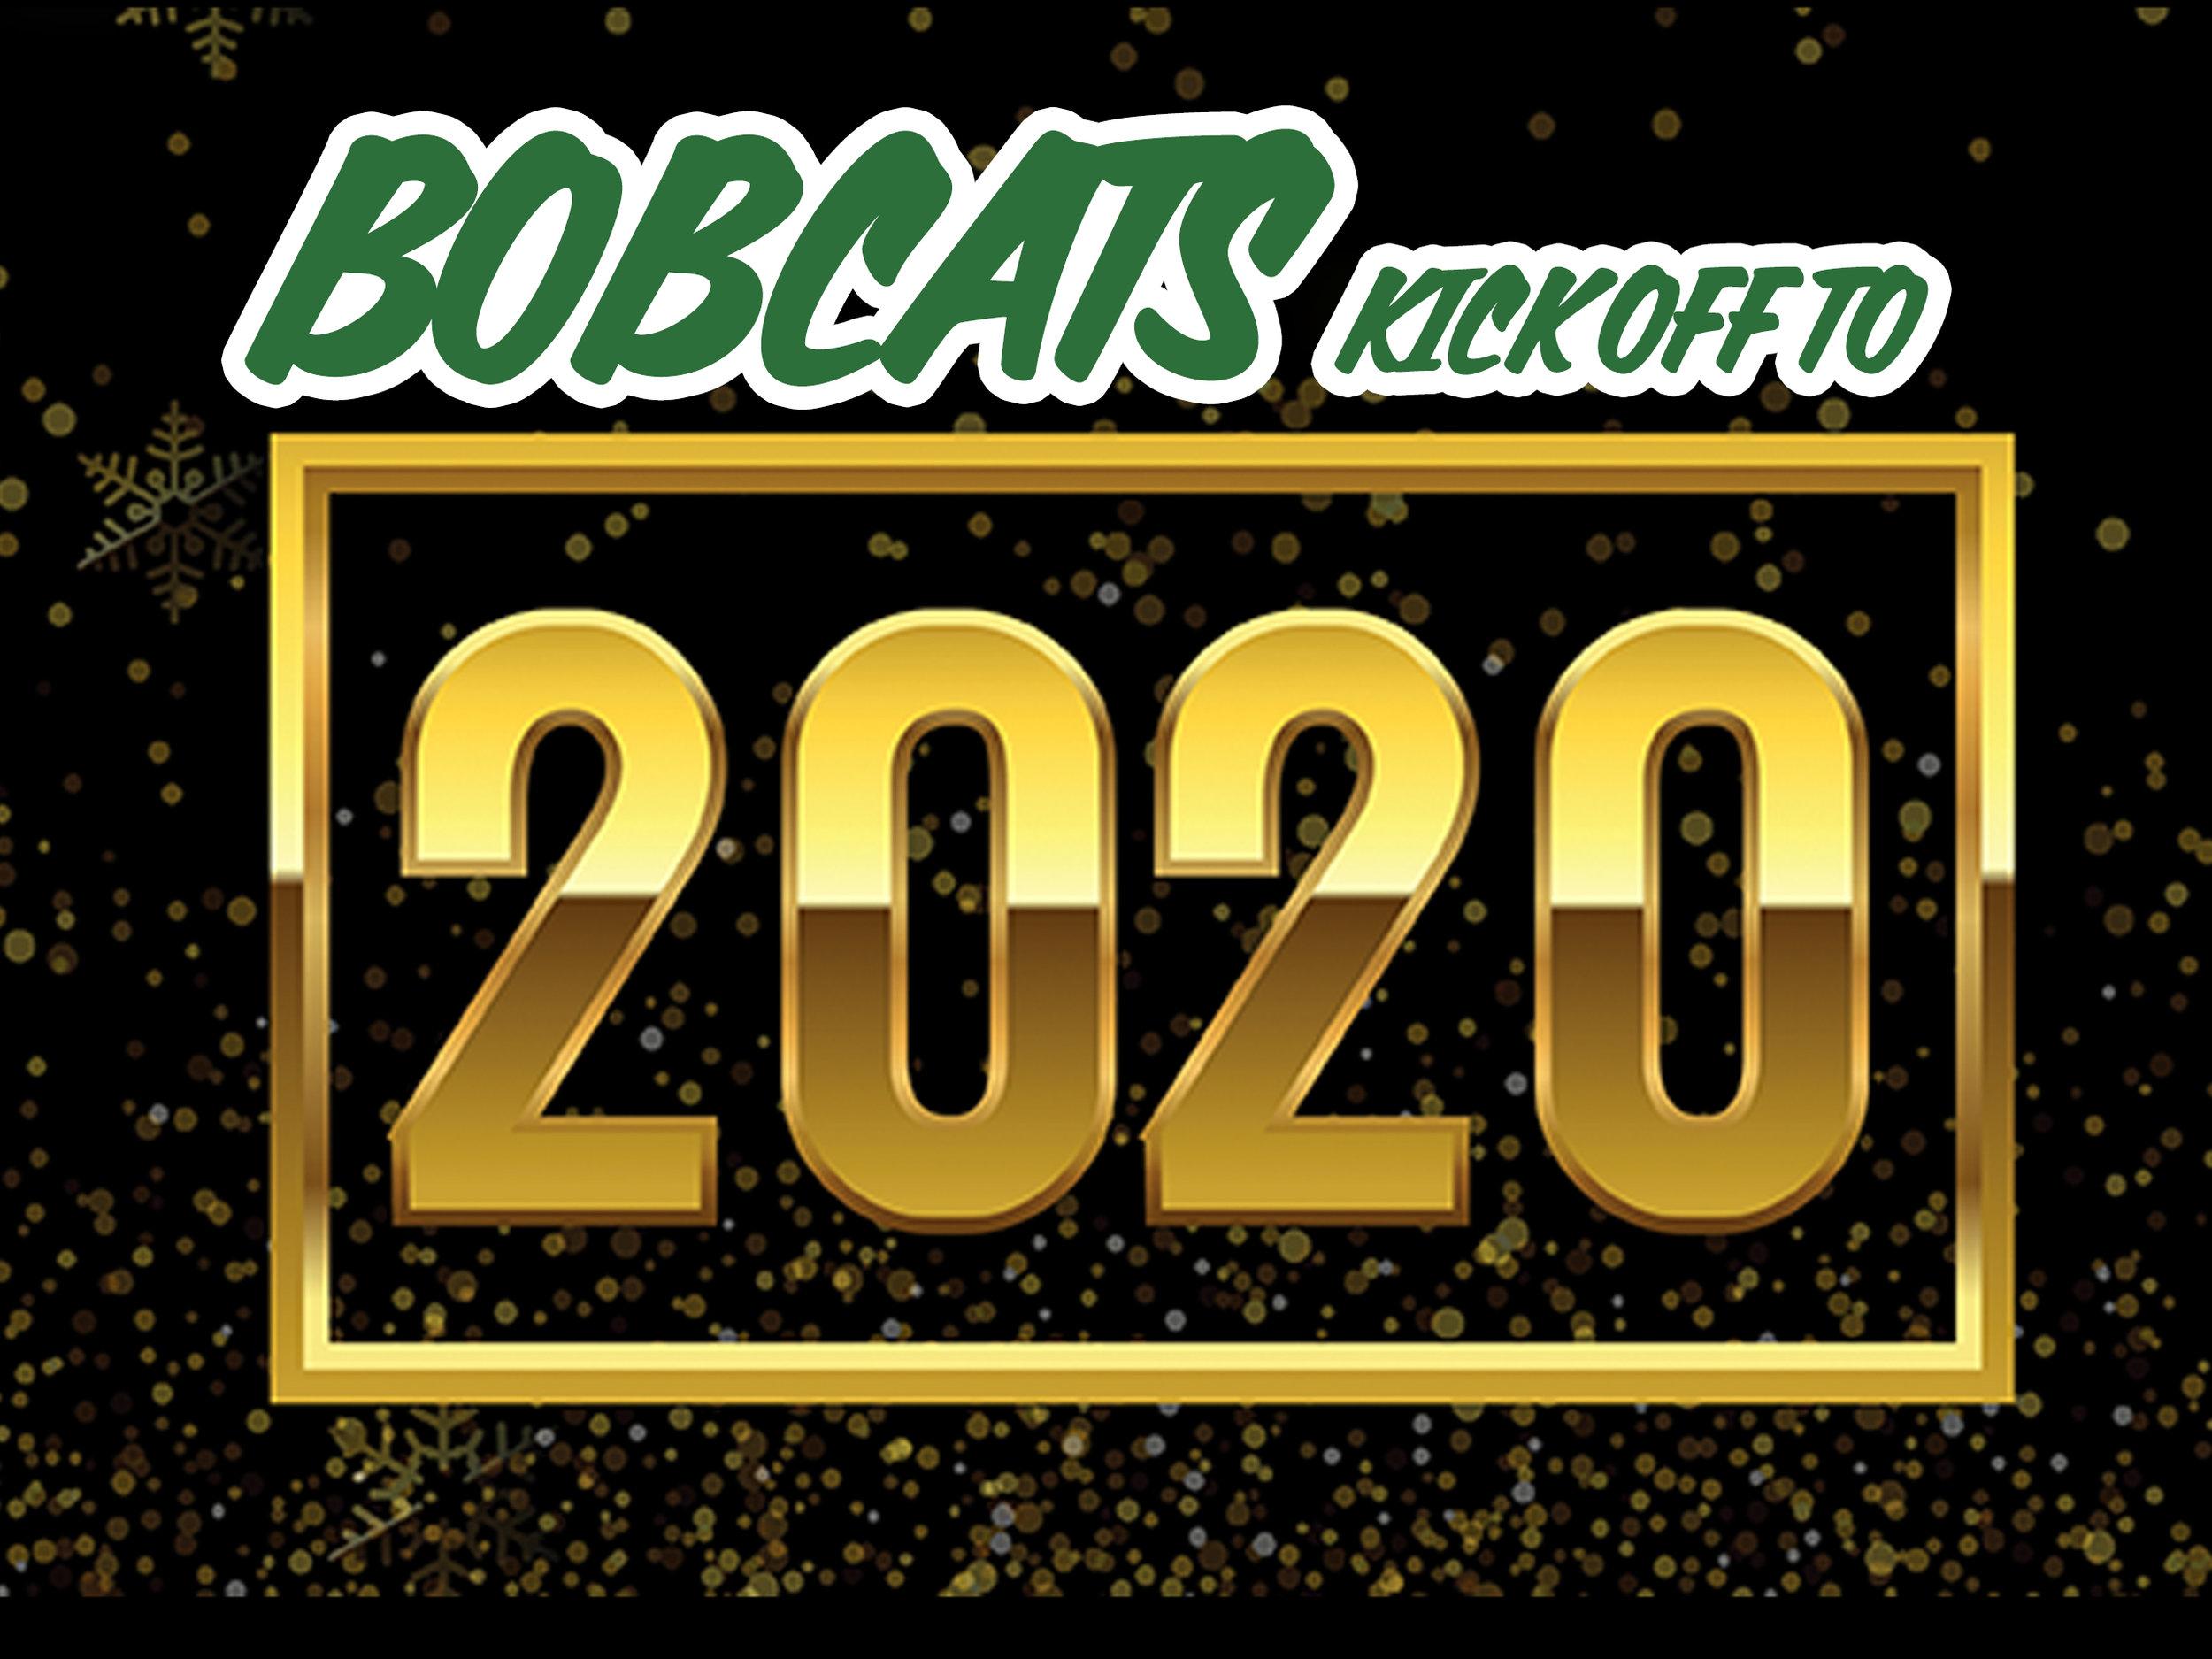 bobcats2020